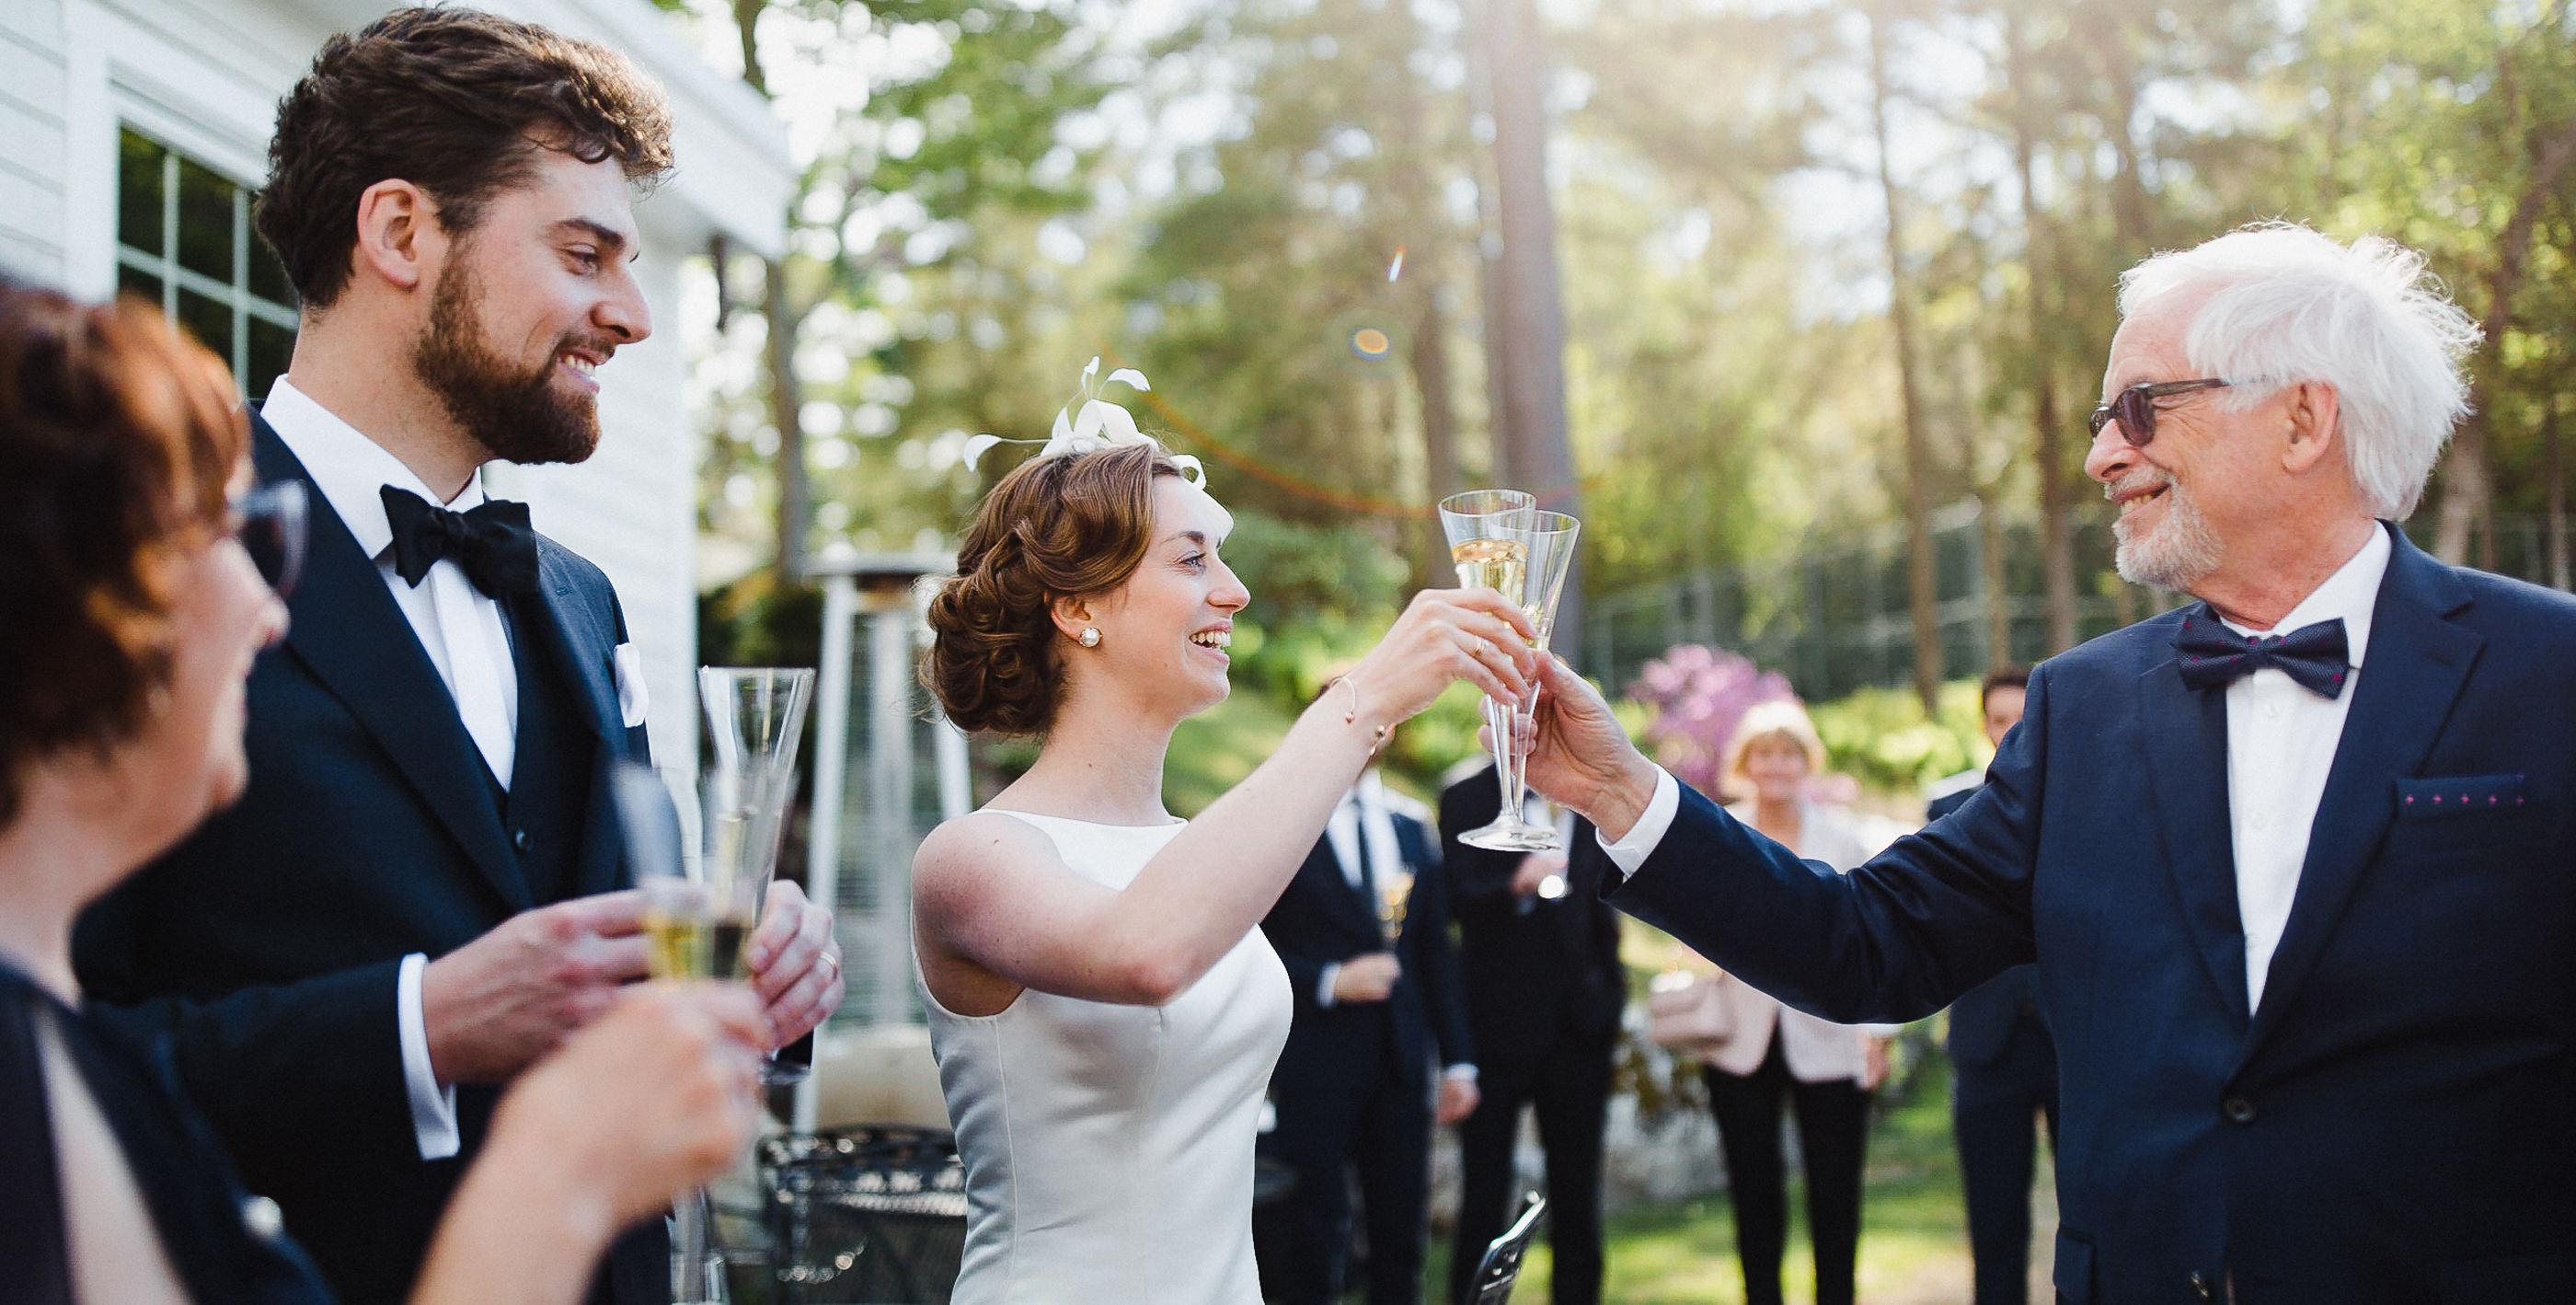 portfolio-photographies-de-mariage-sonia-bourdon-022